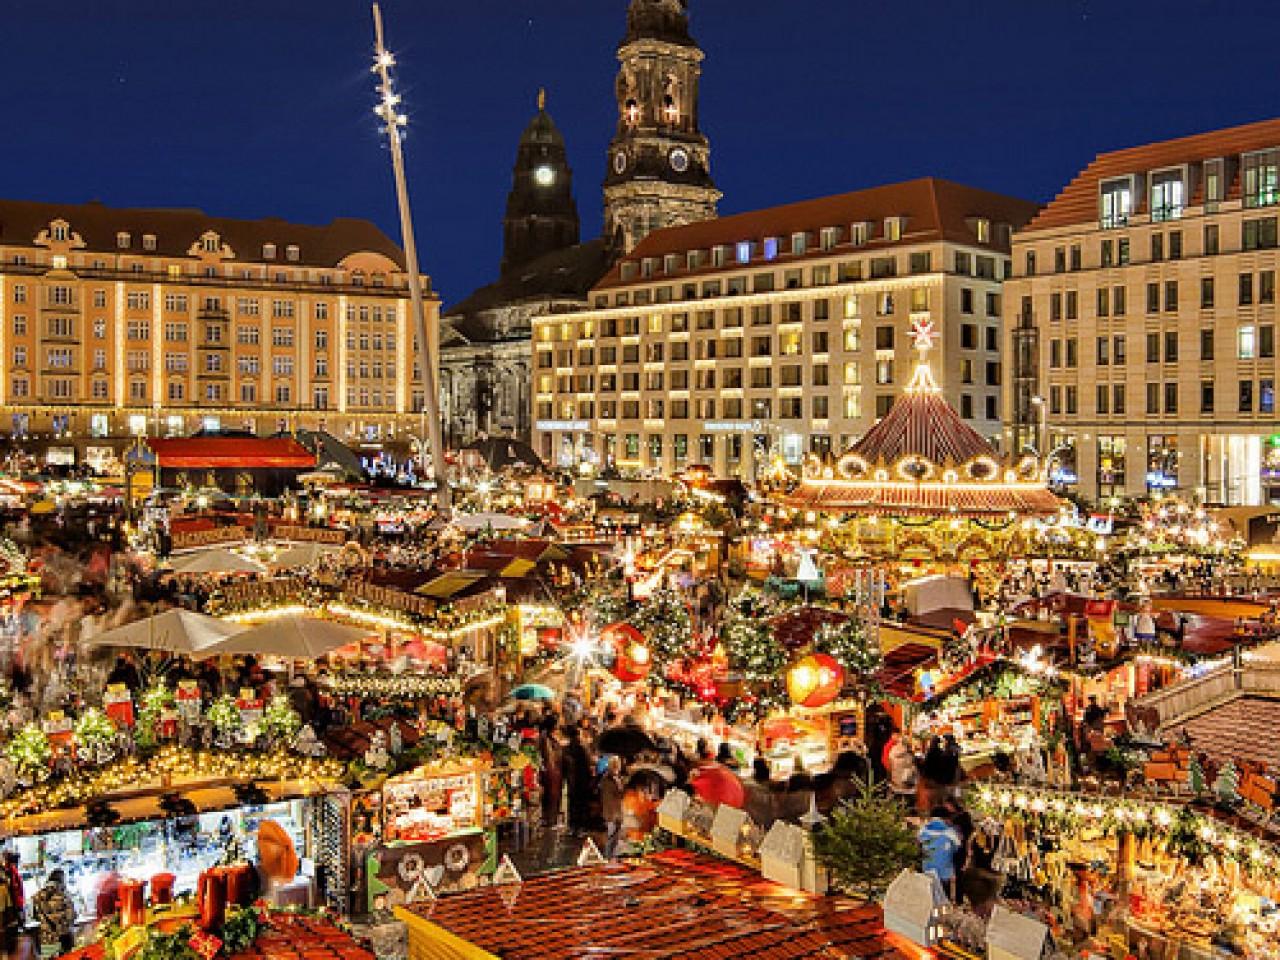 Budapest at Christmas: 09 December 2021